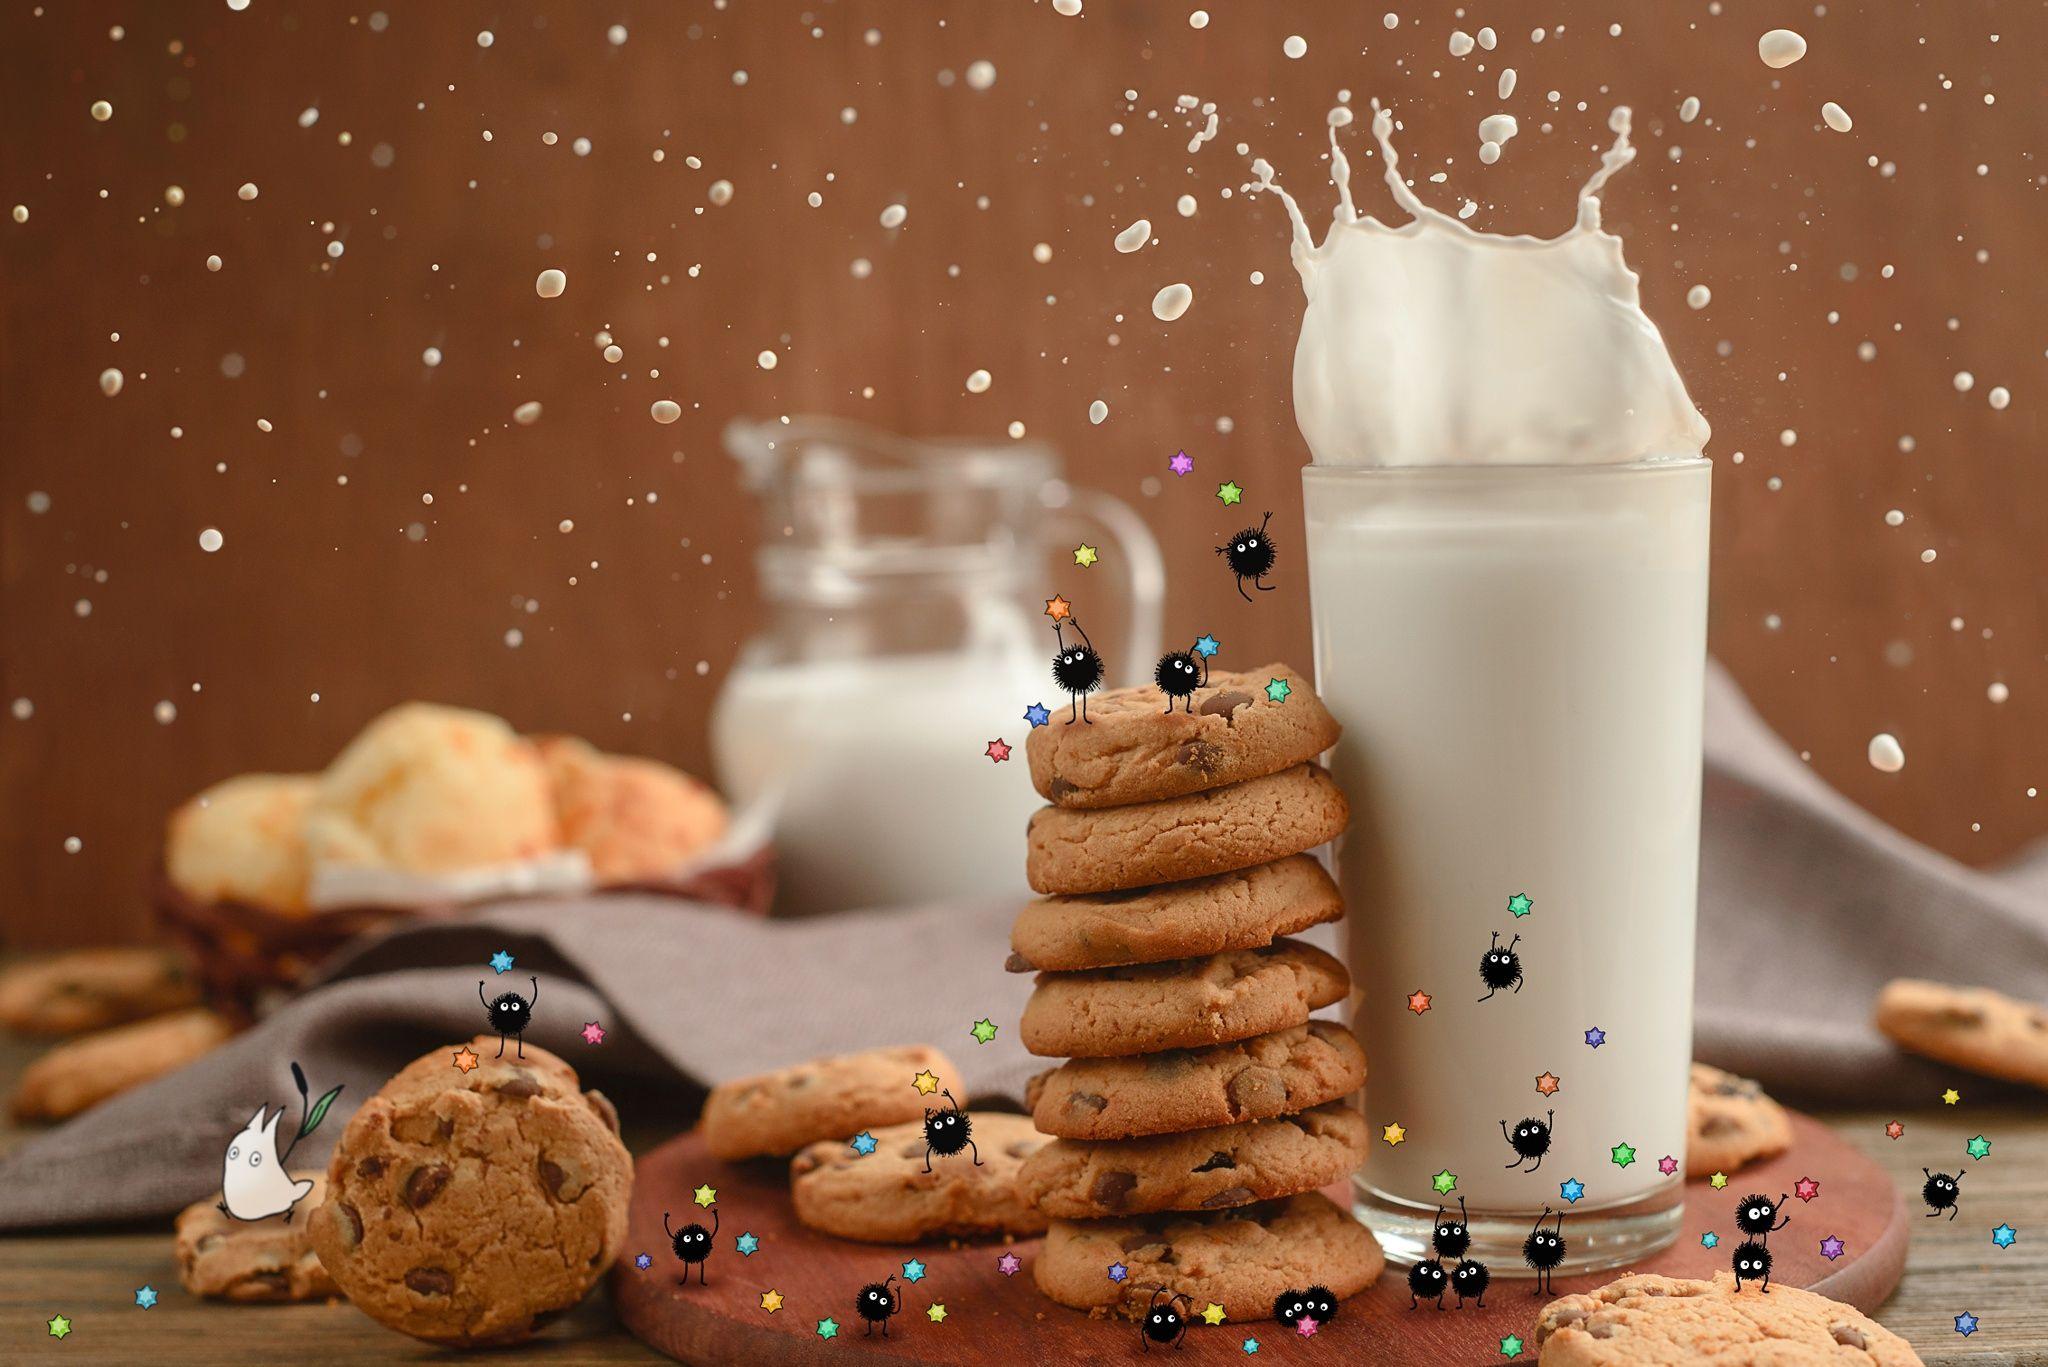 Картинка печенька и молоко